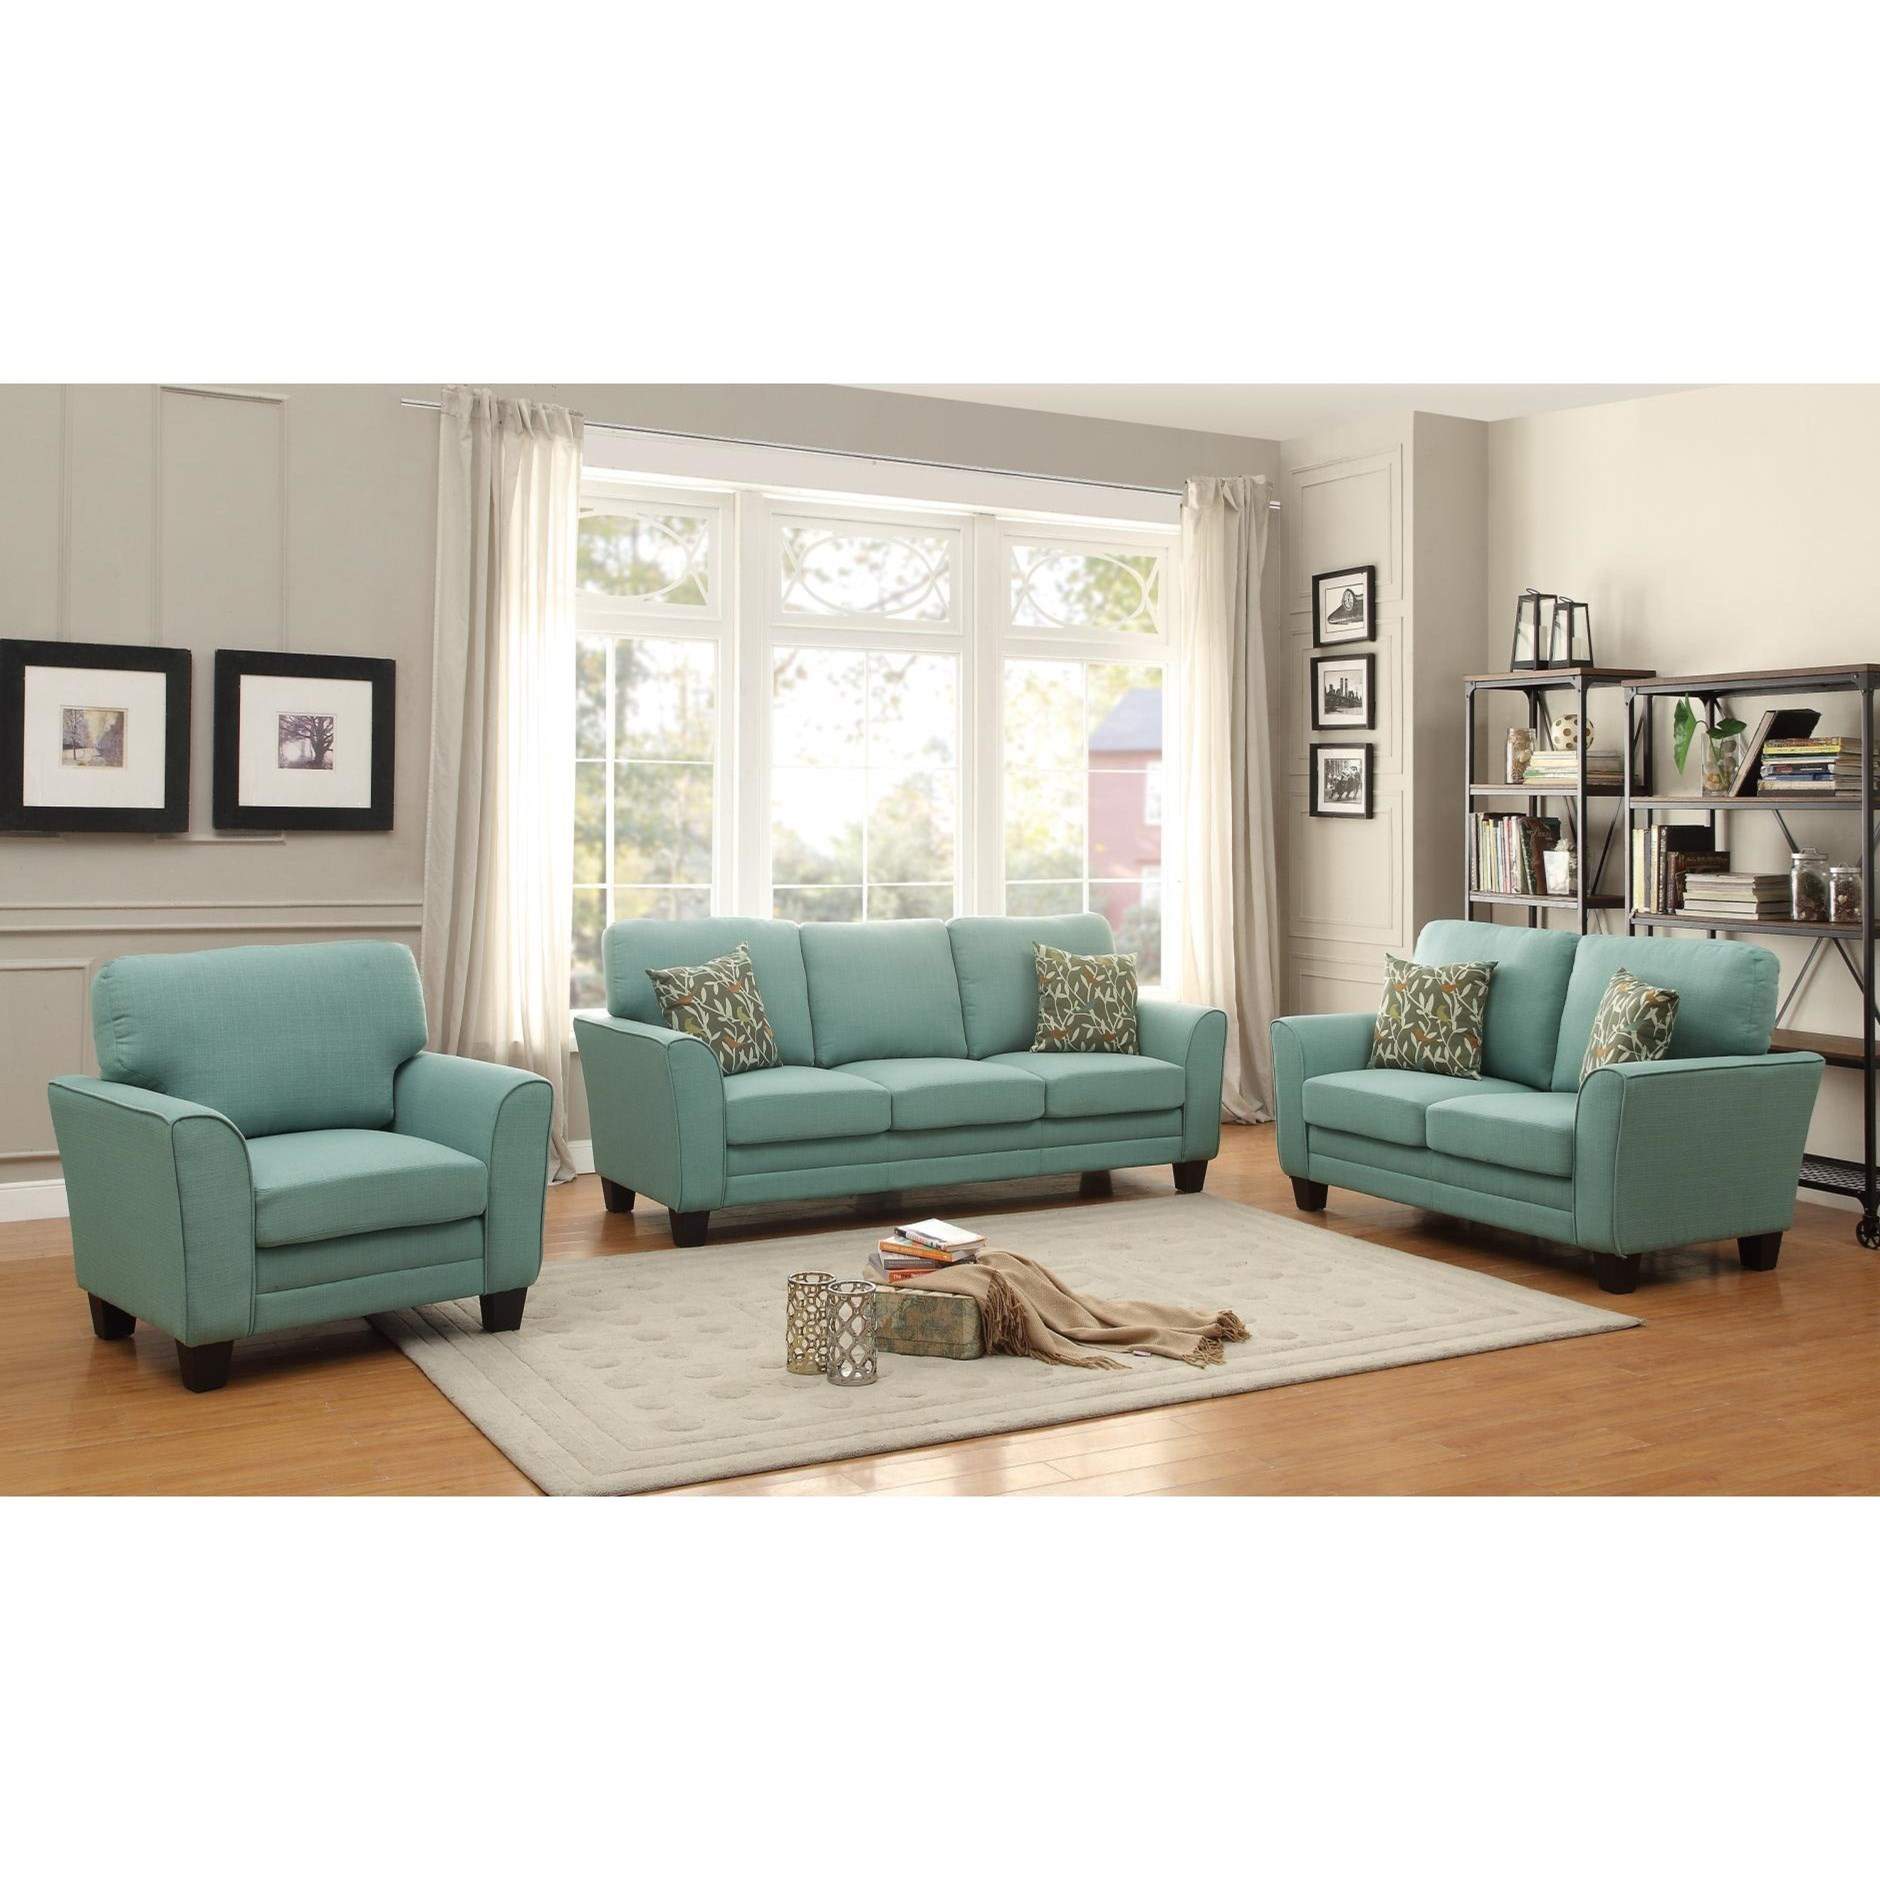 Adair Living Room Group by Homelegance at Carolina Direct